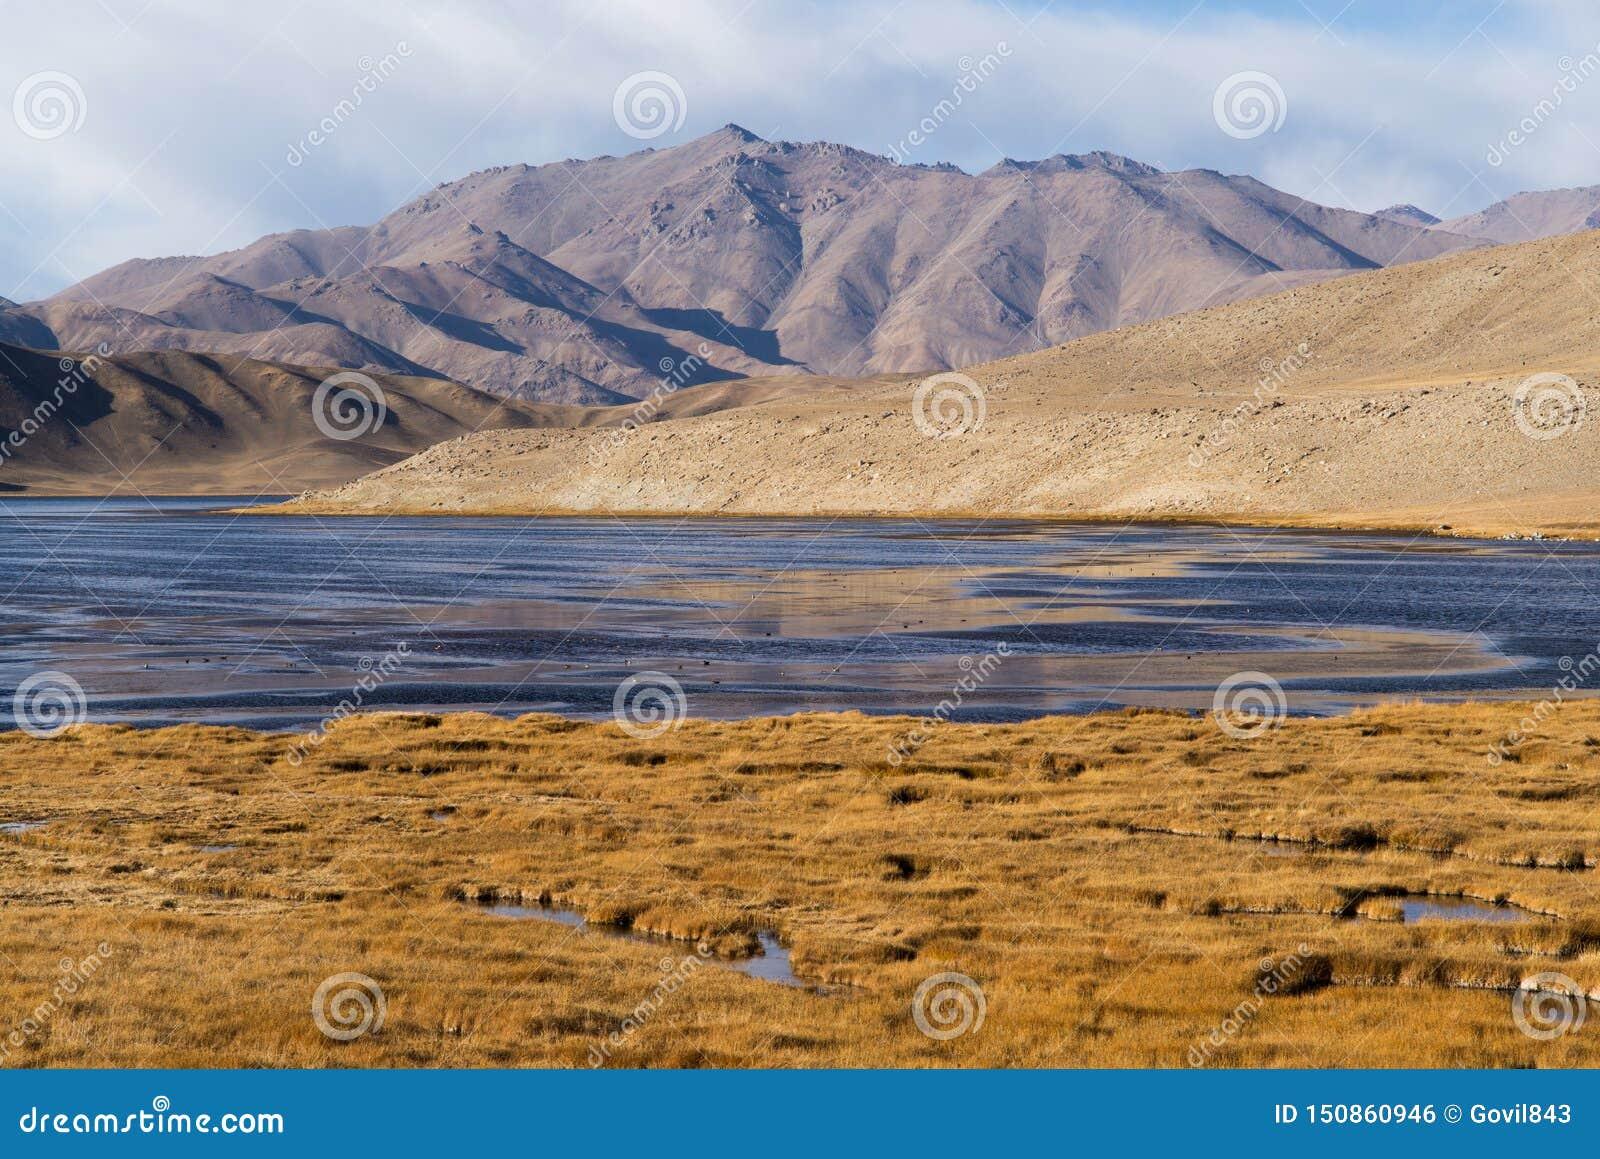 Bulunkul, Τατζικιστάν: Όμορφη άποψη της λίμνης Bulunkul Pamir στο Τατζικιστάν